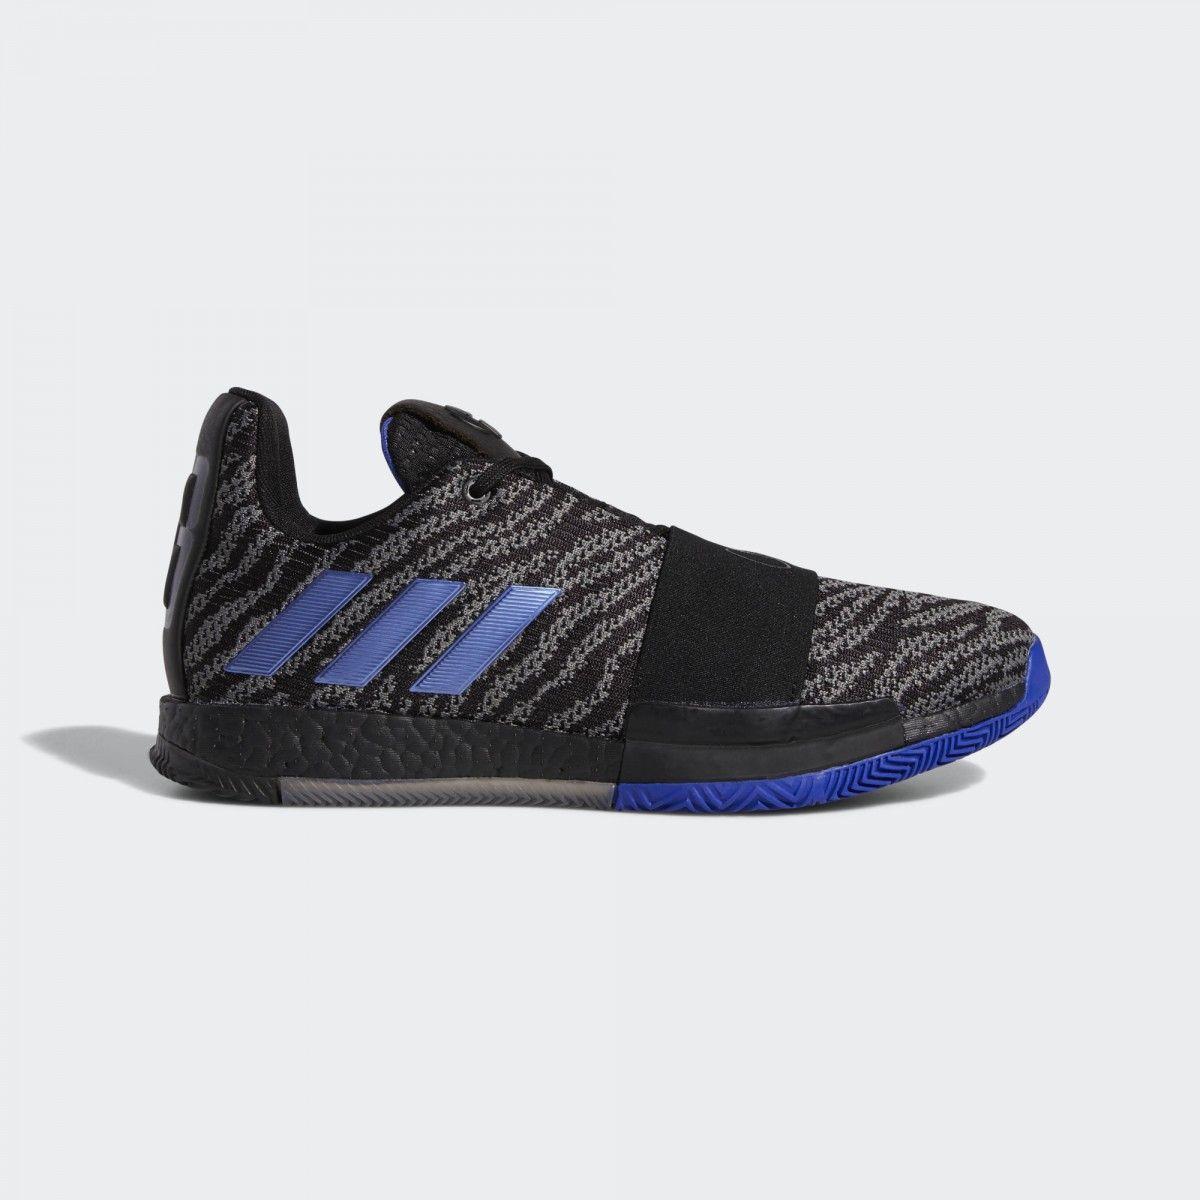 G26811 Slc Ecom Jpg Sepatu Basket Adidas Sepatu